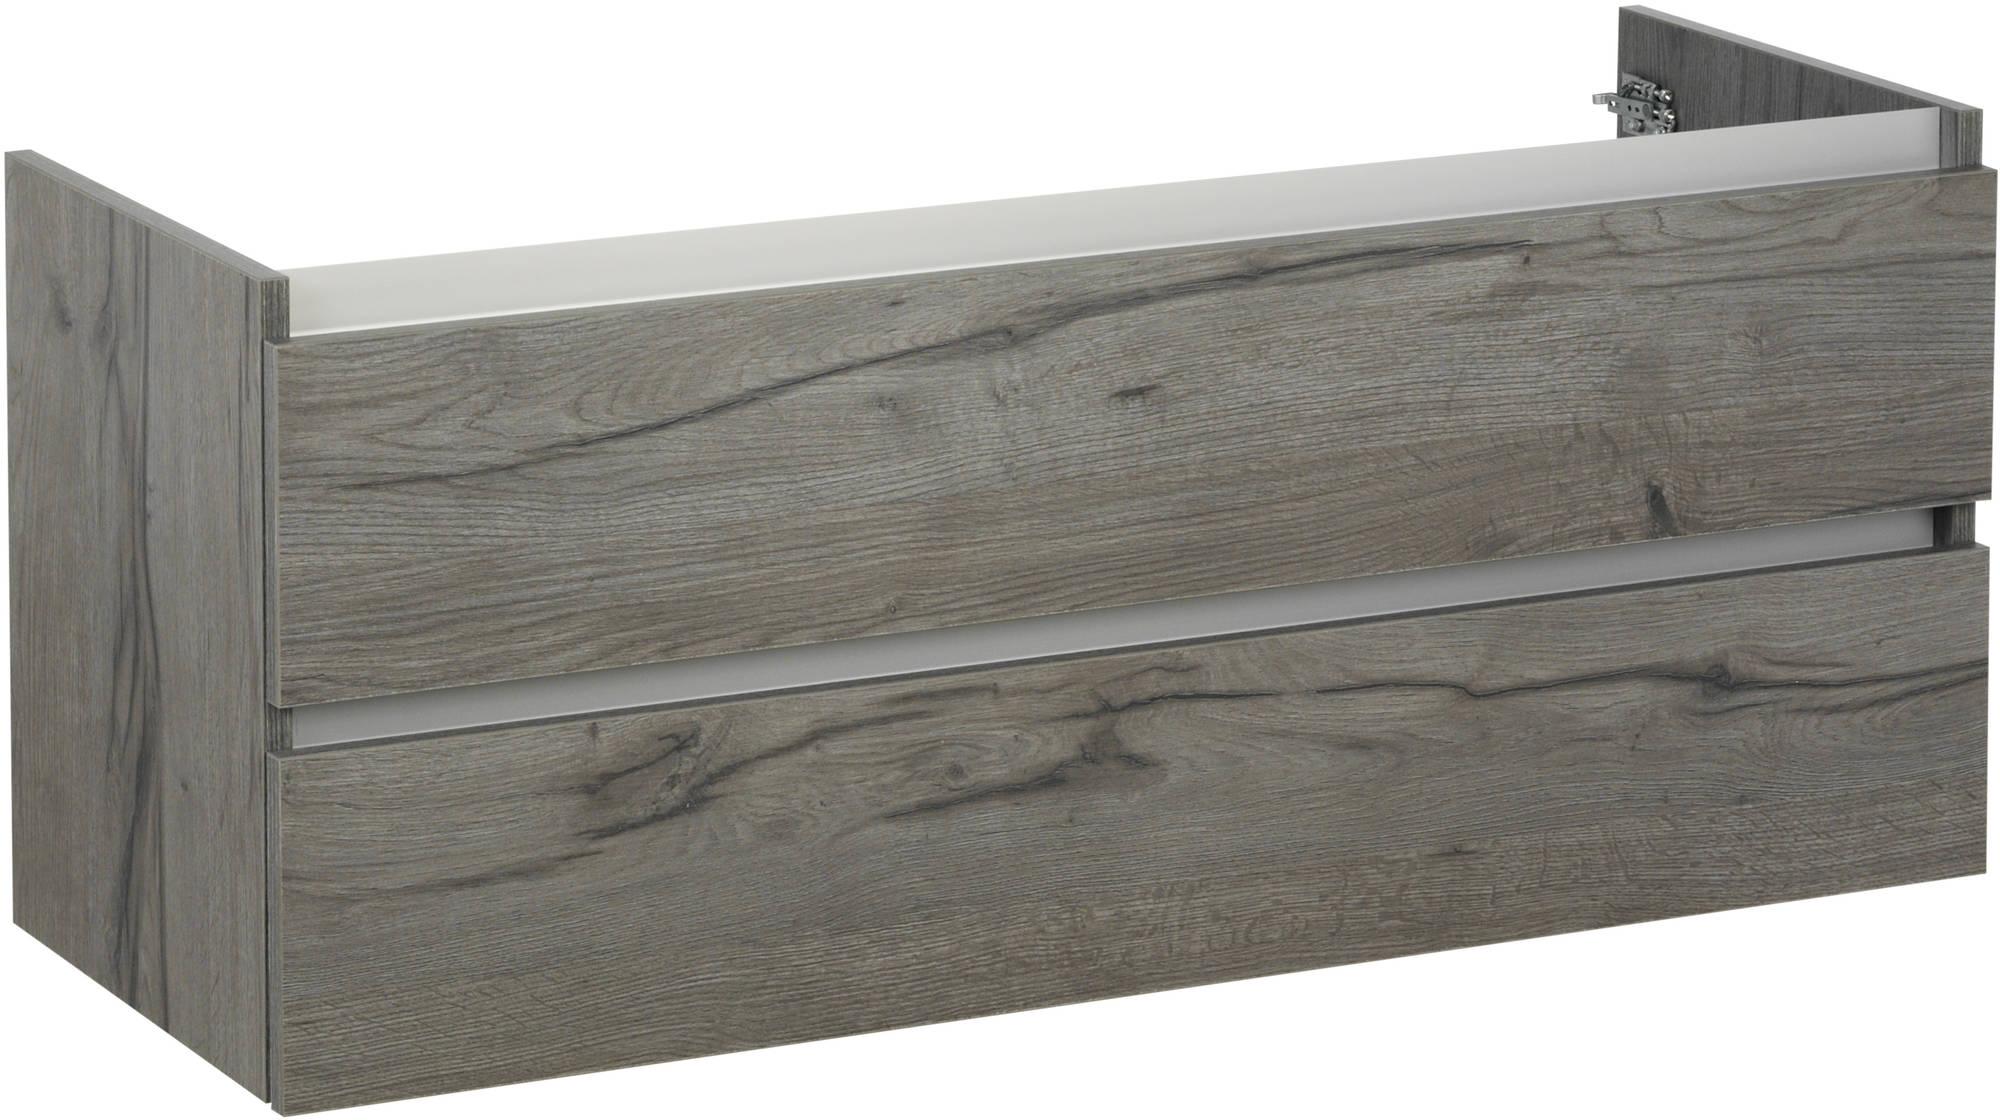 Ben Limara Wastafelonderkast 140x44,5x50cm Cape Elm/Aluminium